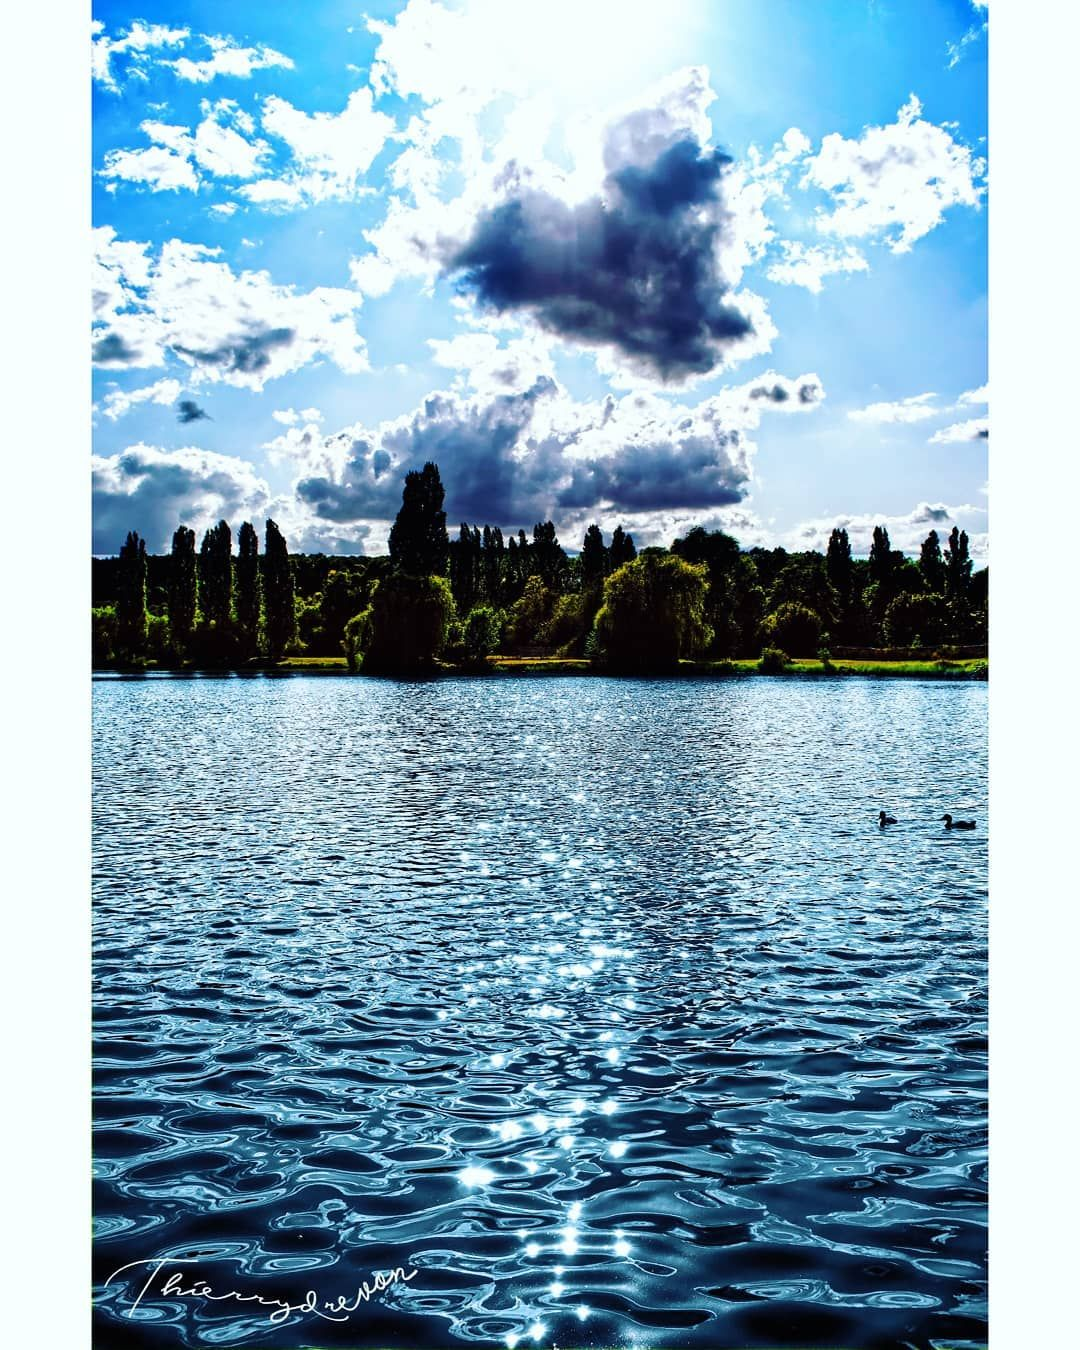 Landscapes Landscapephotography Landscape Naturephotography Naturelovers 9vaga Alltags9 Lakes Lake Nature Photography Landscape Photography Landscape